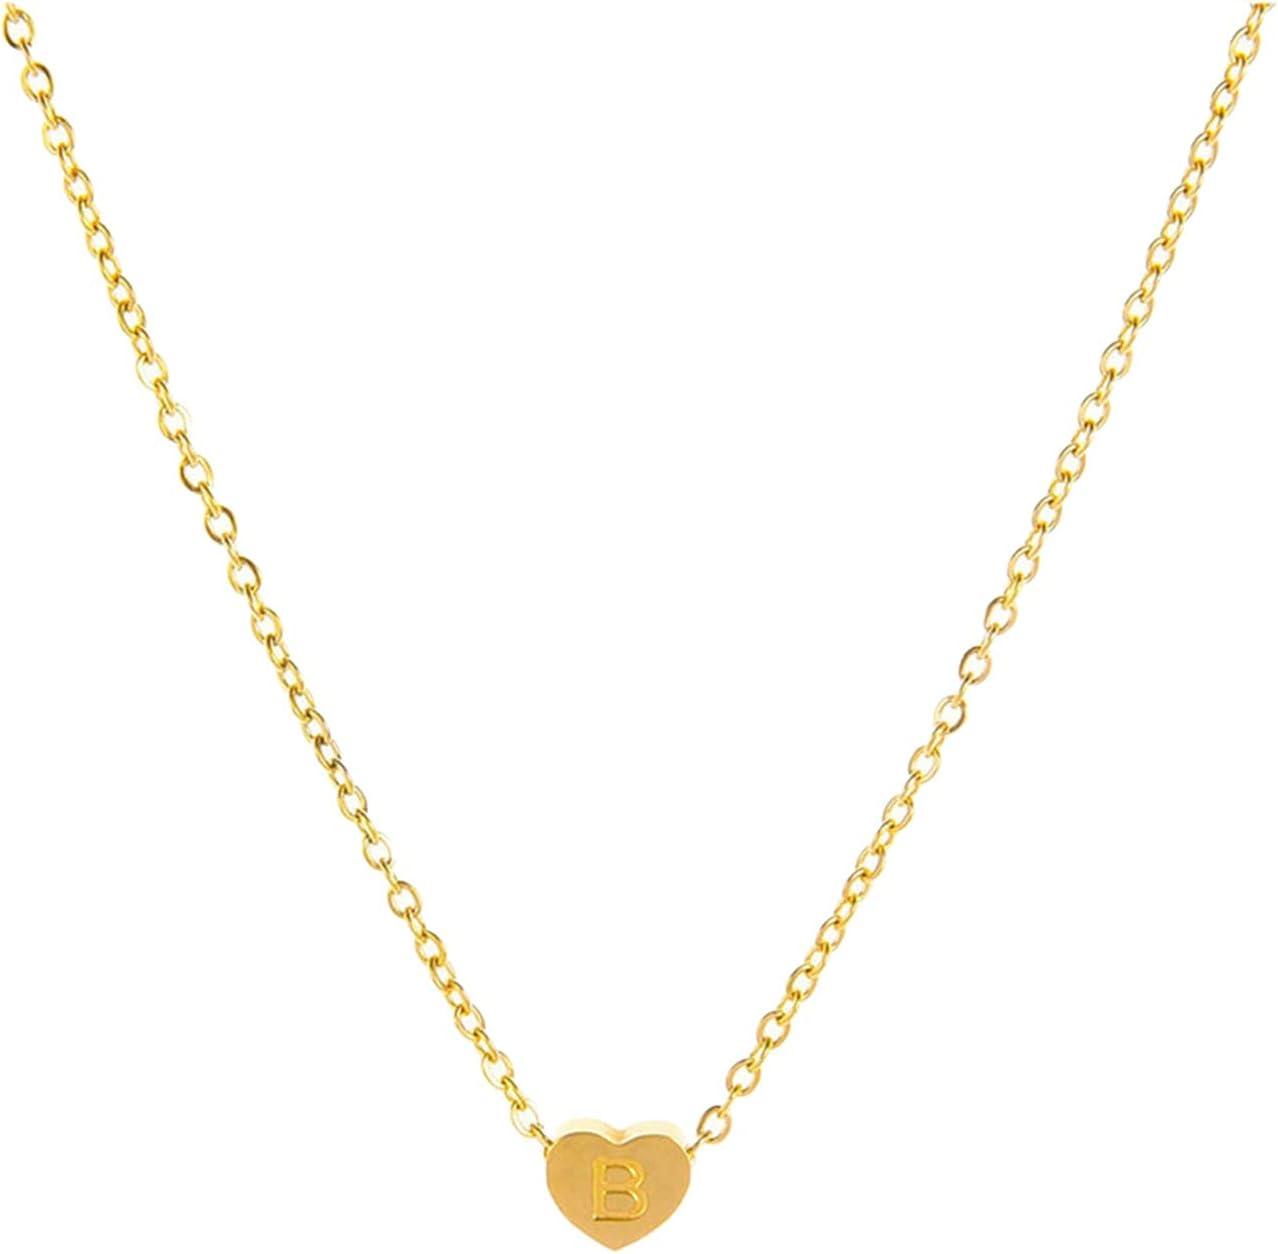 MORECON Women's Fashion Heart Letter Necklace 26 Letters Love Clavicle Neck Chain Engagement Necklace, Souvenir Necklace, Ideal Gift for Women Girlfriends (B)